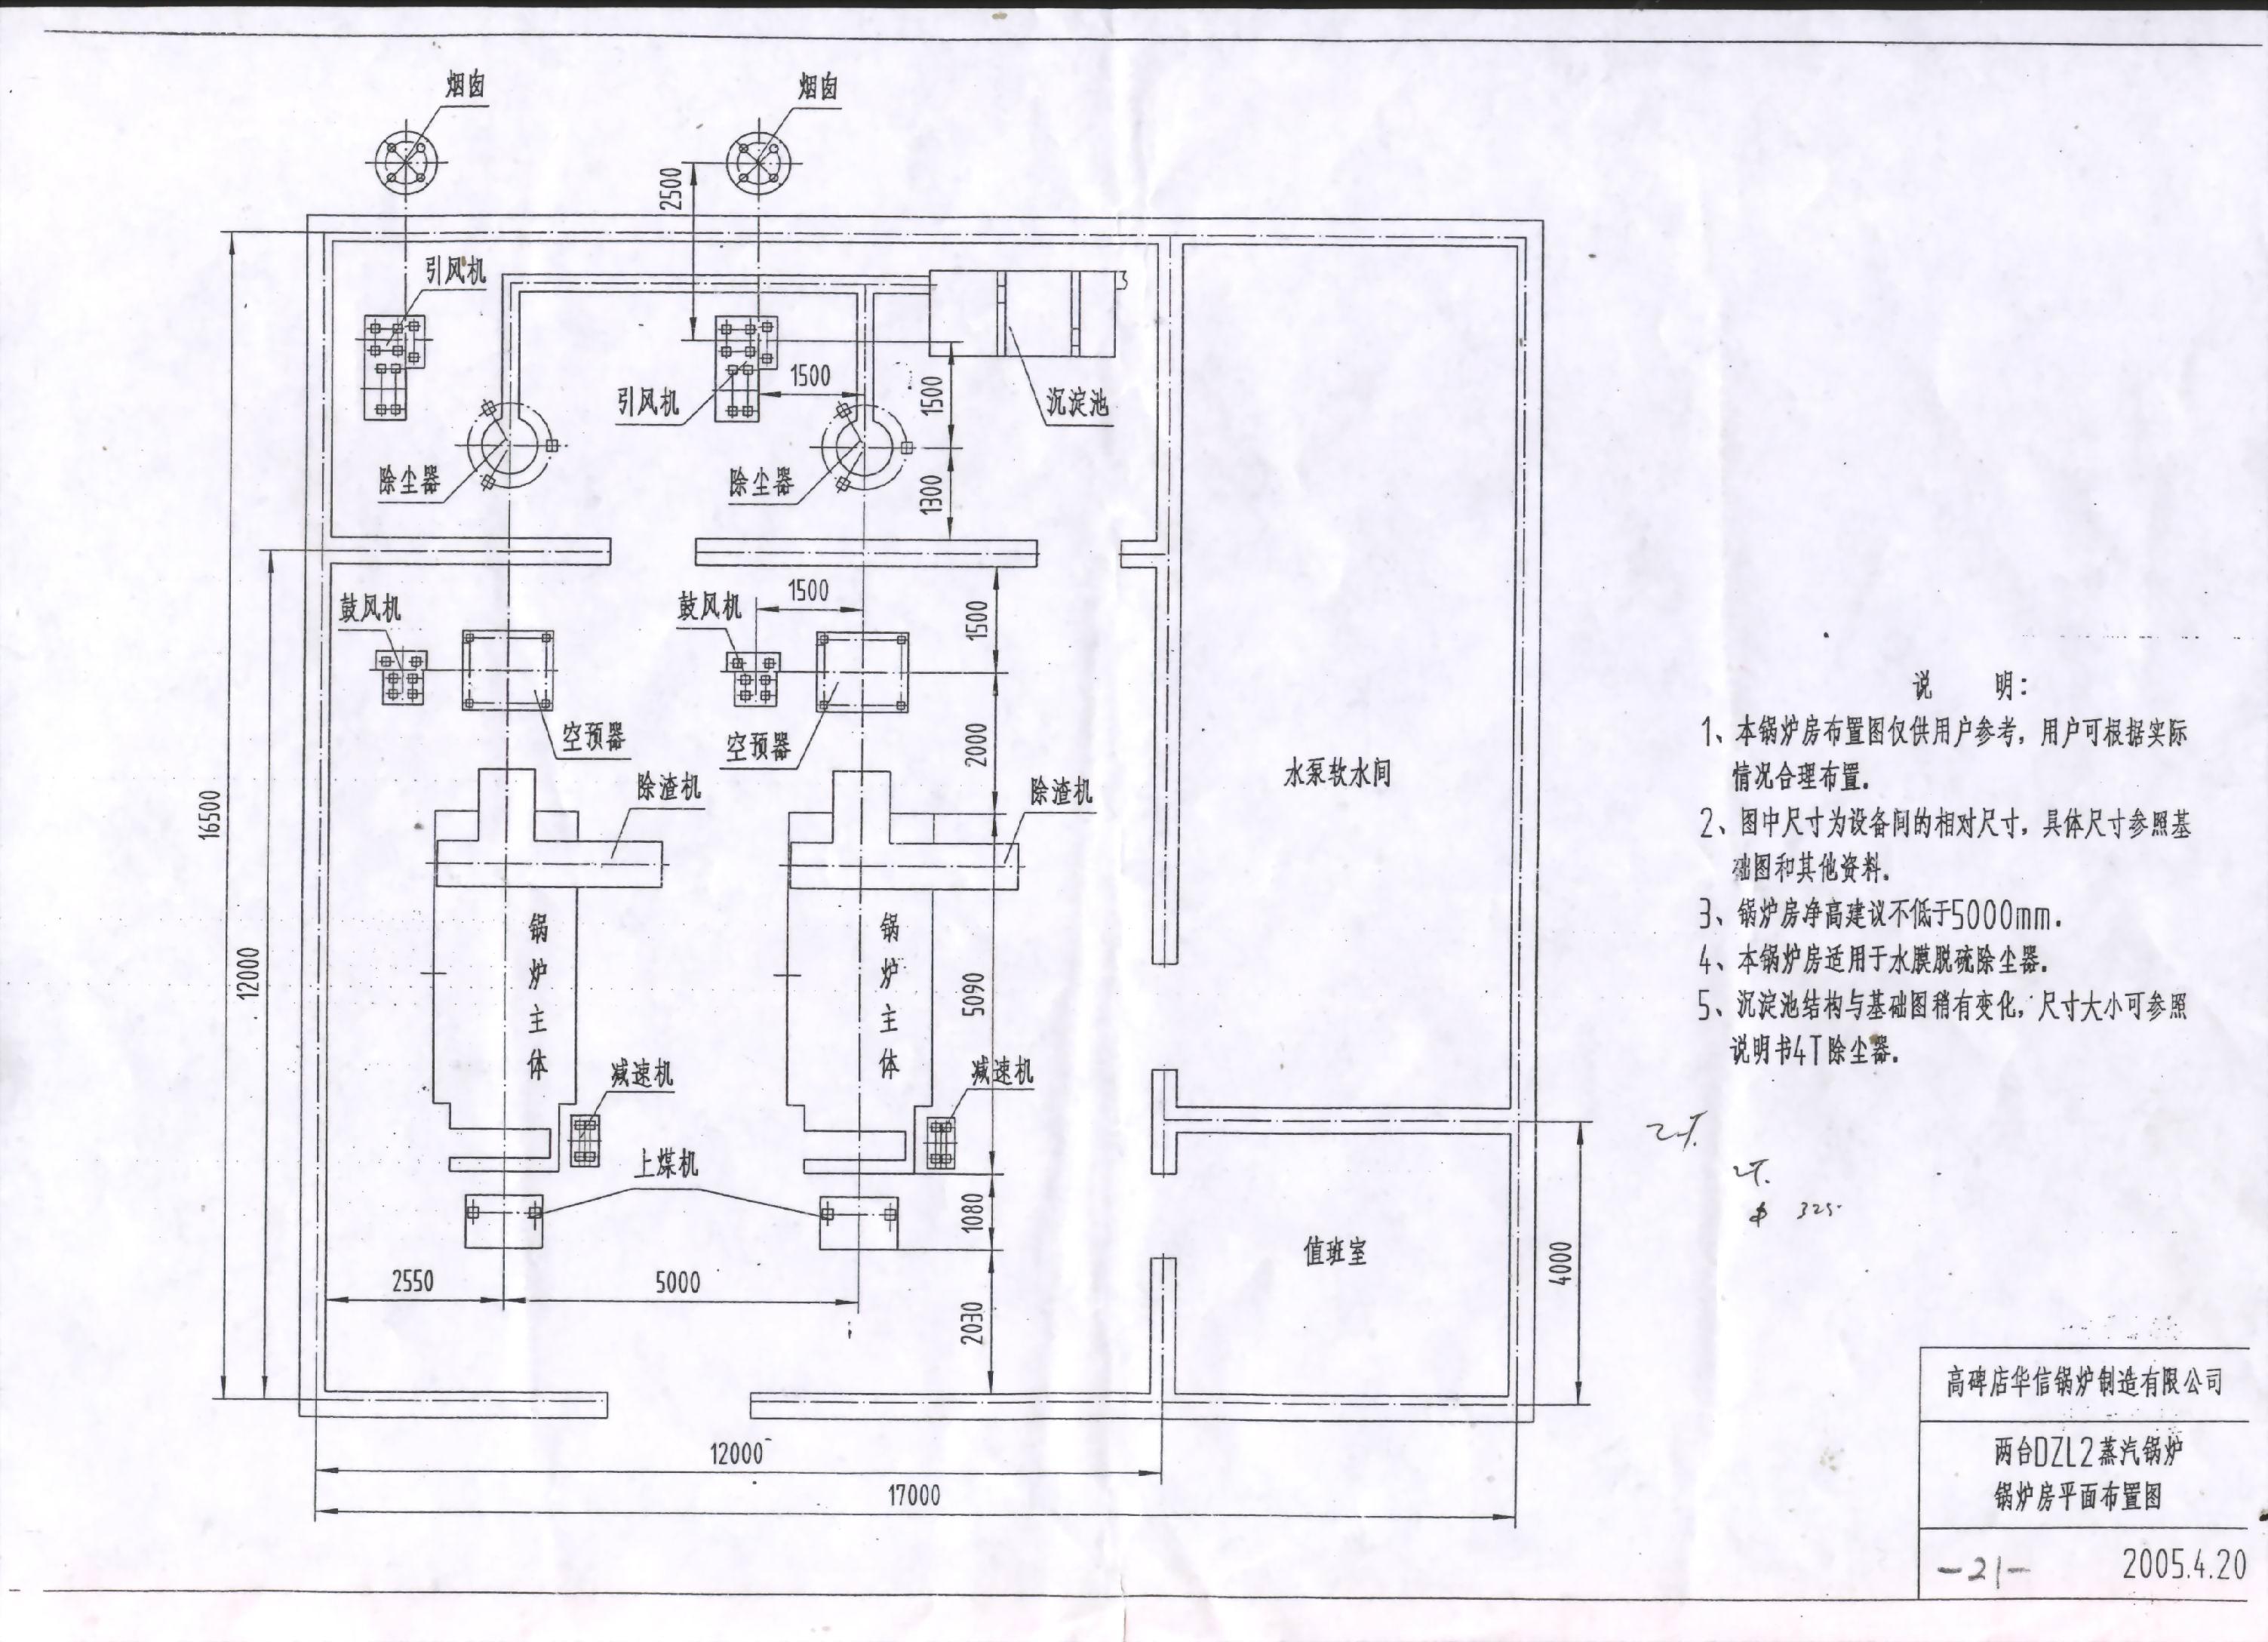 dzl2锅炉房图纸图片